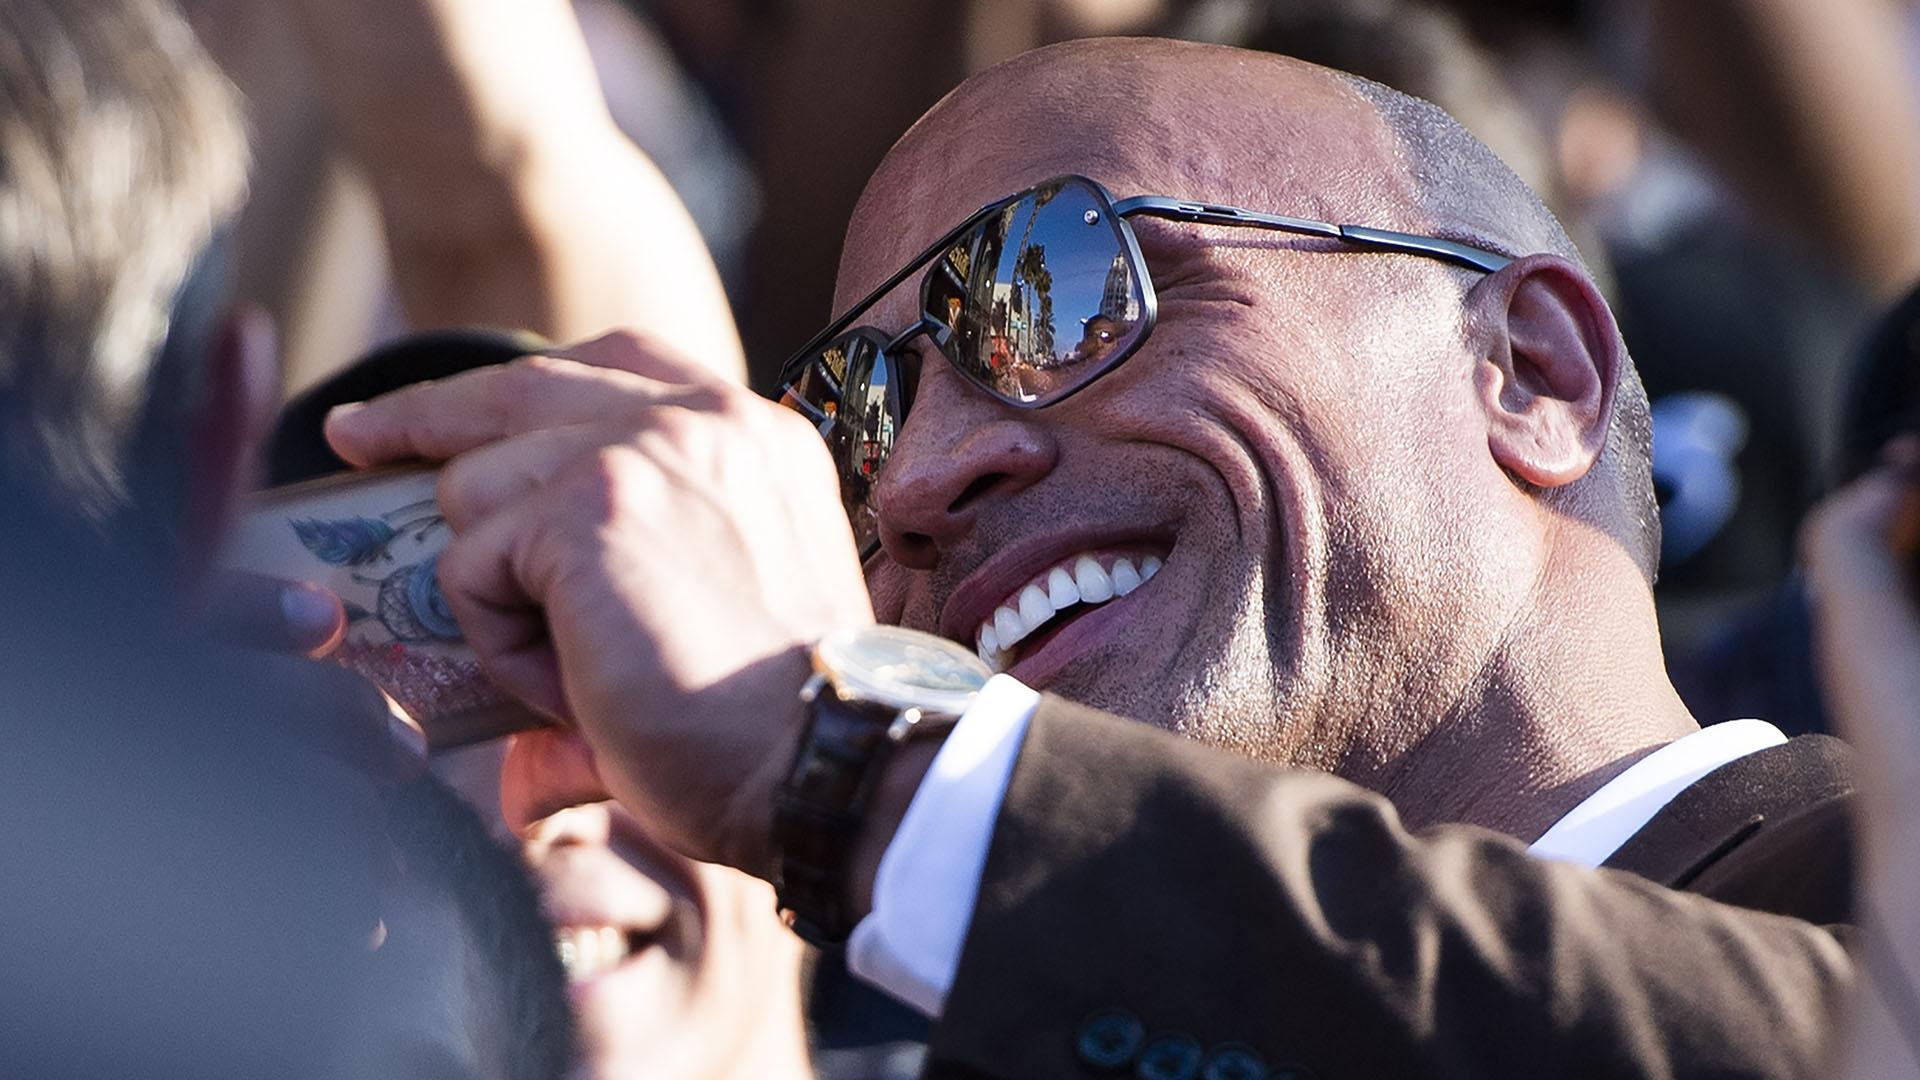 Dwayne Johnson, The Rock, saludando a los fans en la premiere de'Fast & Furious: Hobbs & Shaw'